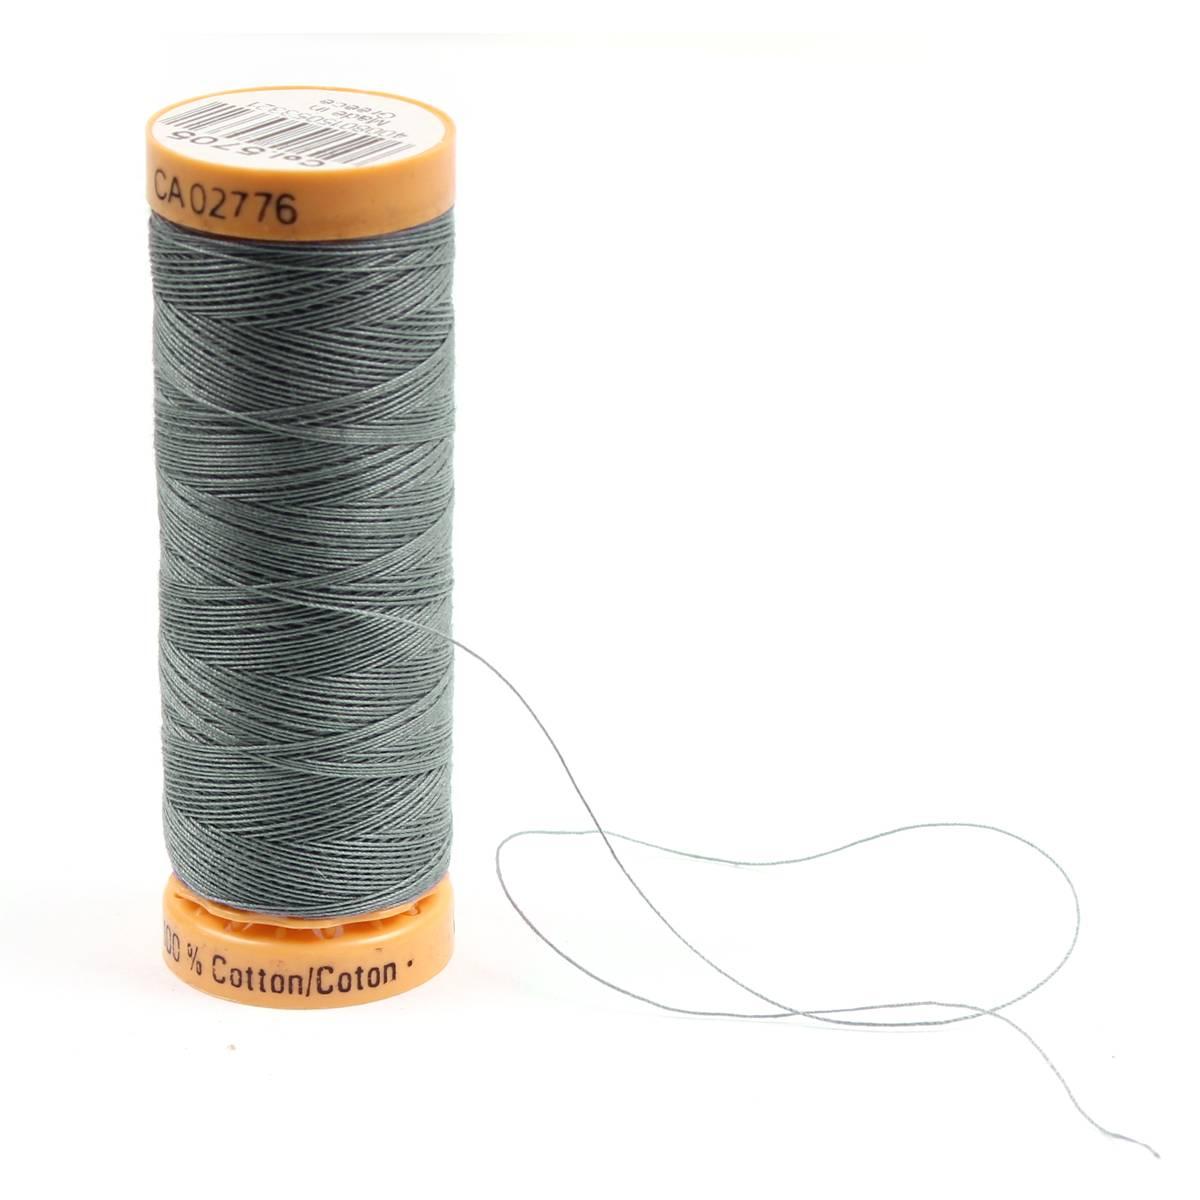 Gutermann Grey Thread G5705 - 100% Cotton - 50wt - Sewing Thread - All Purpose - Domestic